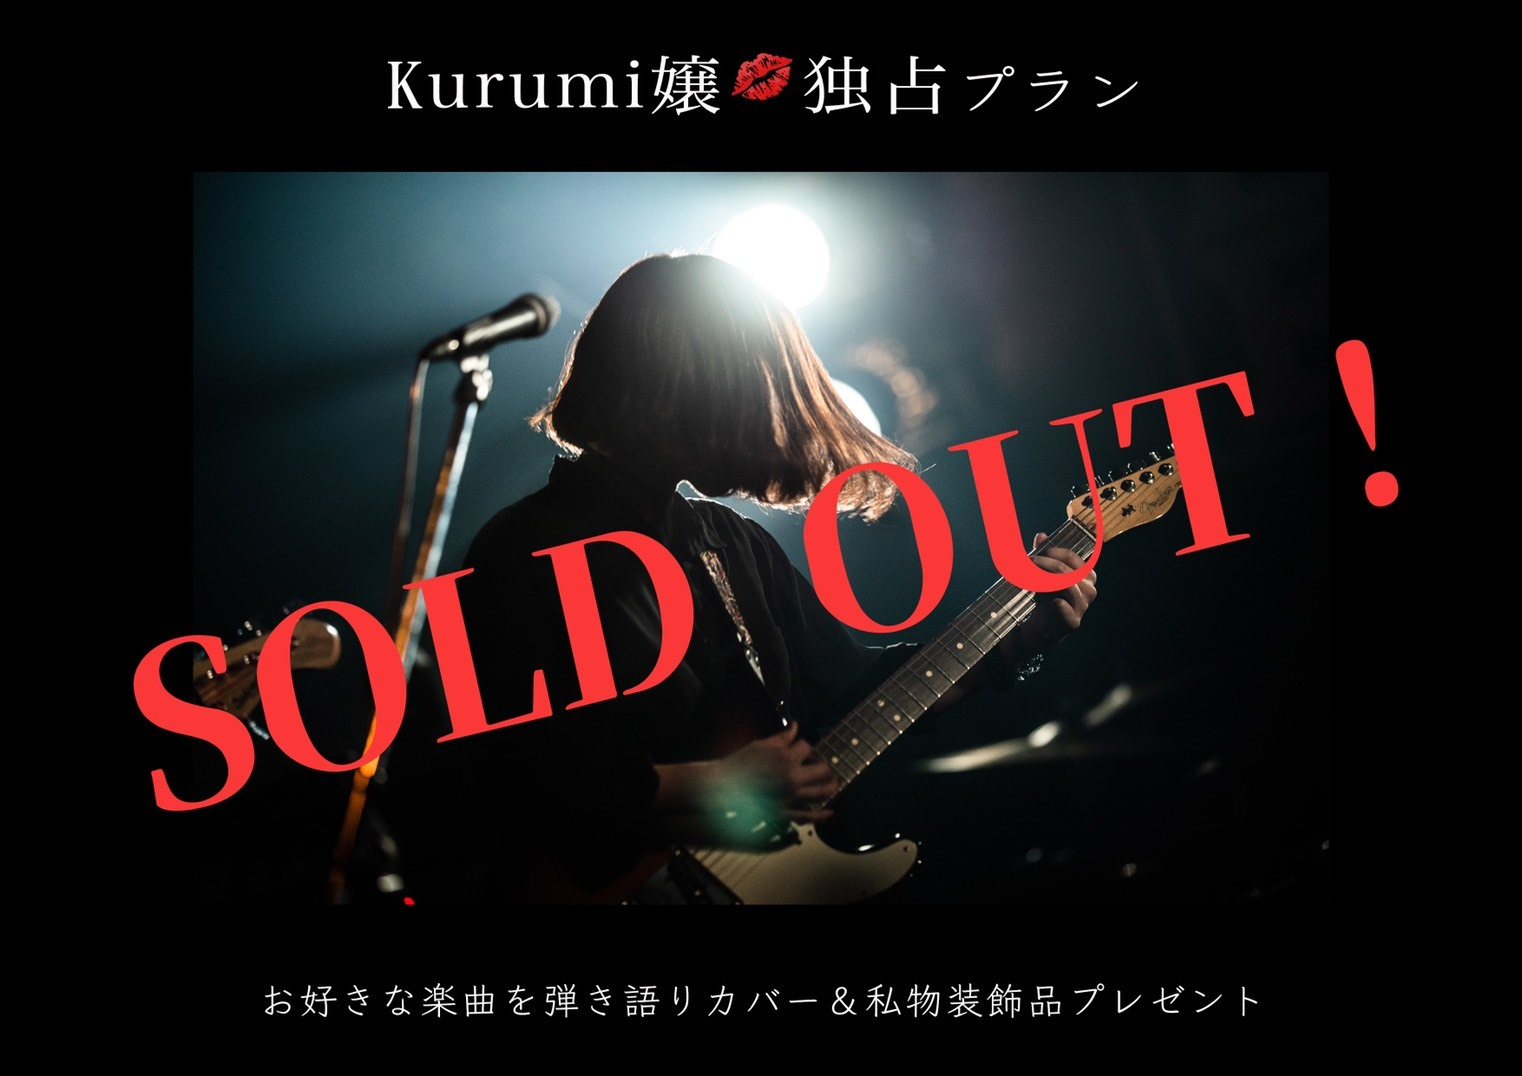 【 Kurumi嬢💋独占プラン 】